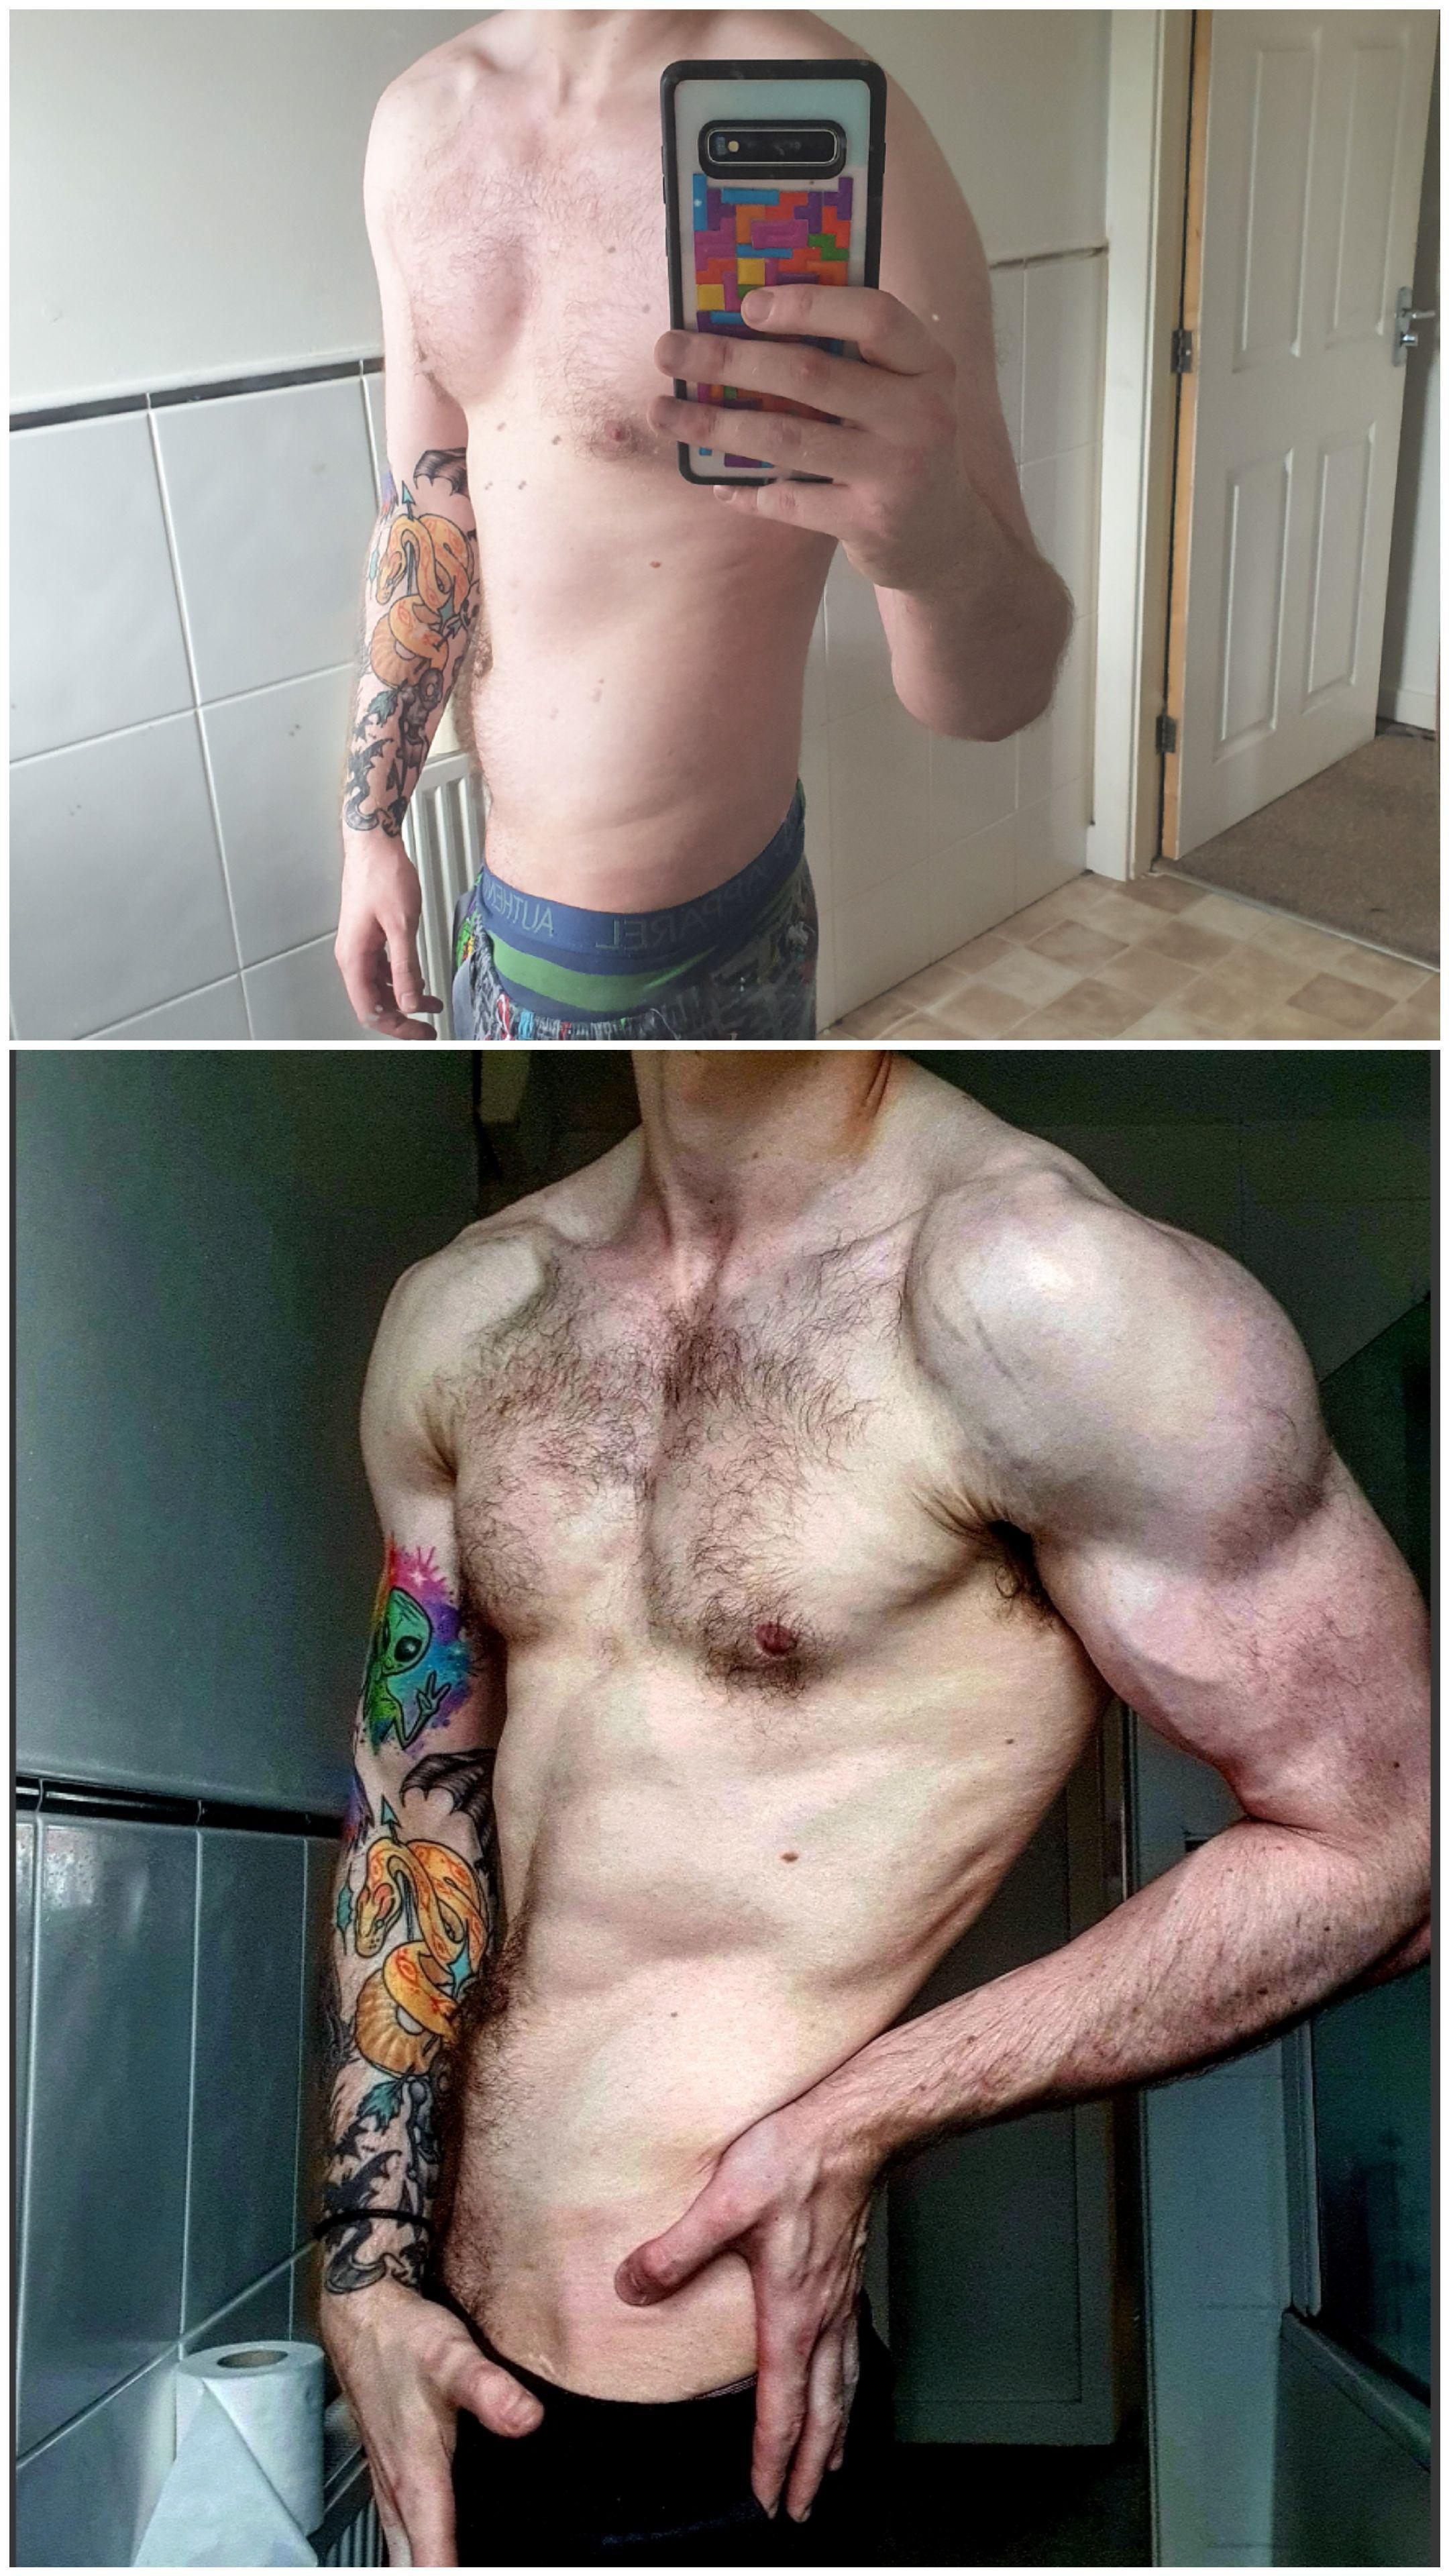 6 foot Male 32 lbs Fat Loss 184 lbs to 152 lbs